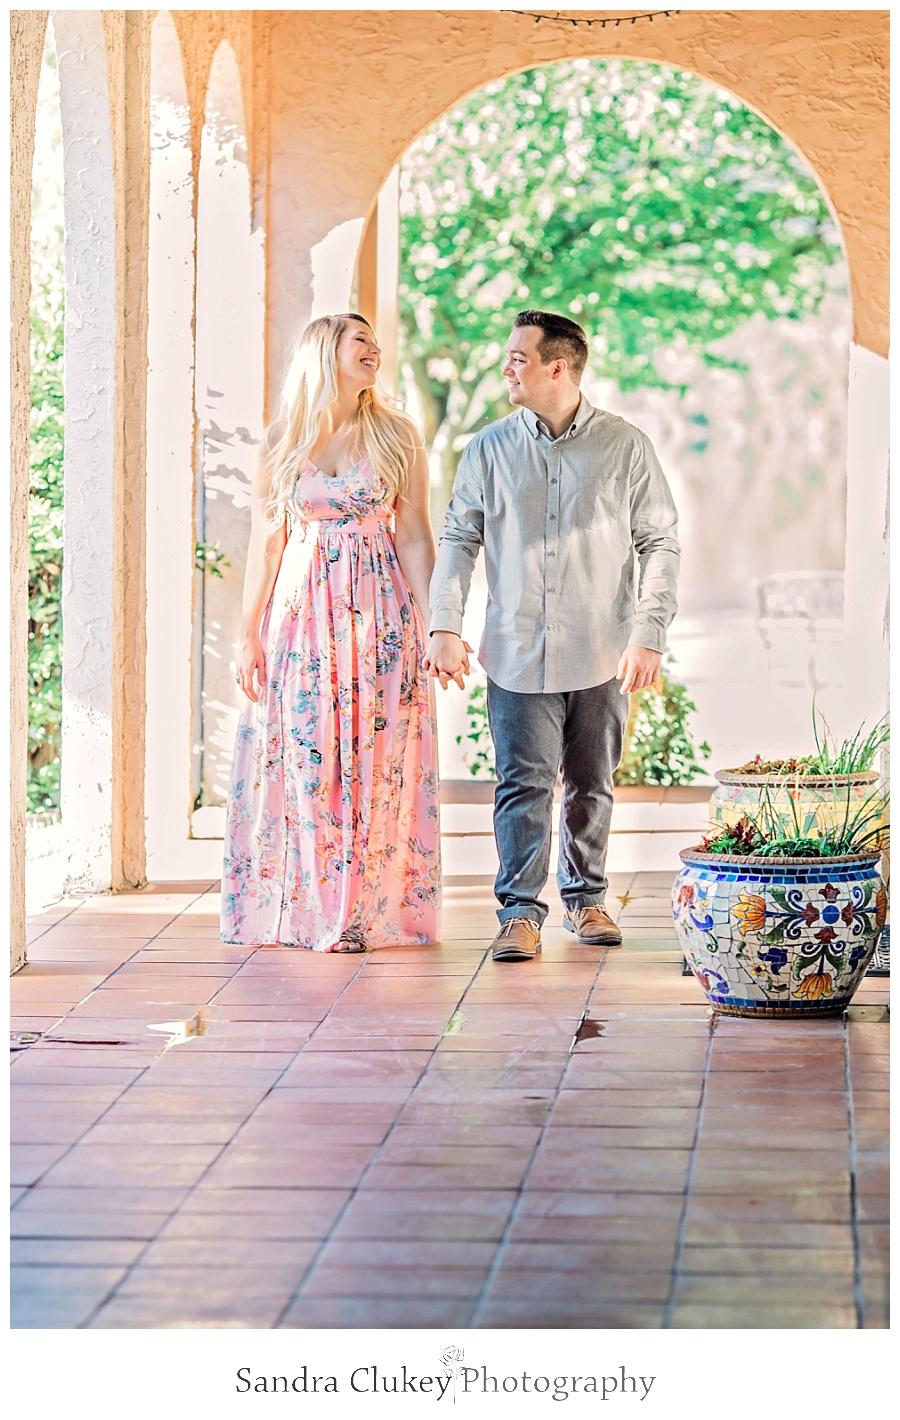 joyful couple strolling hand-in-hand